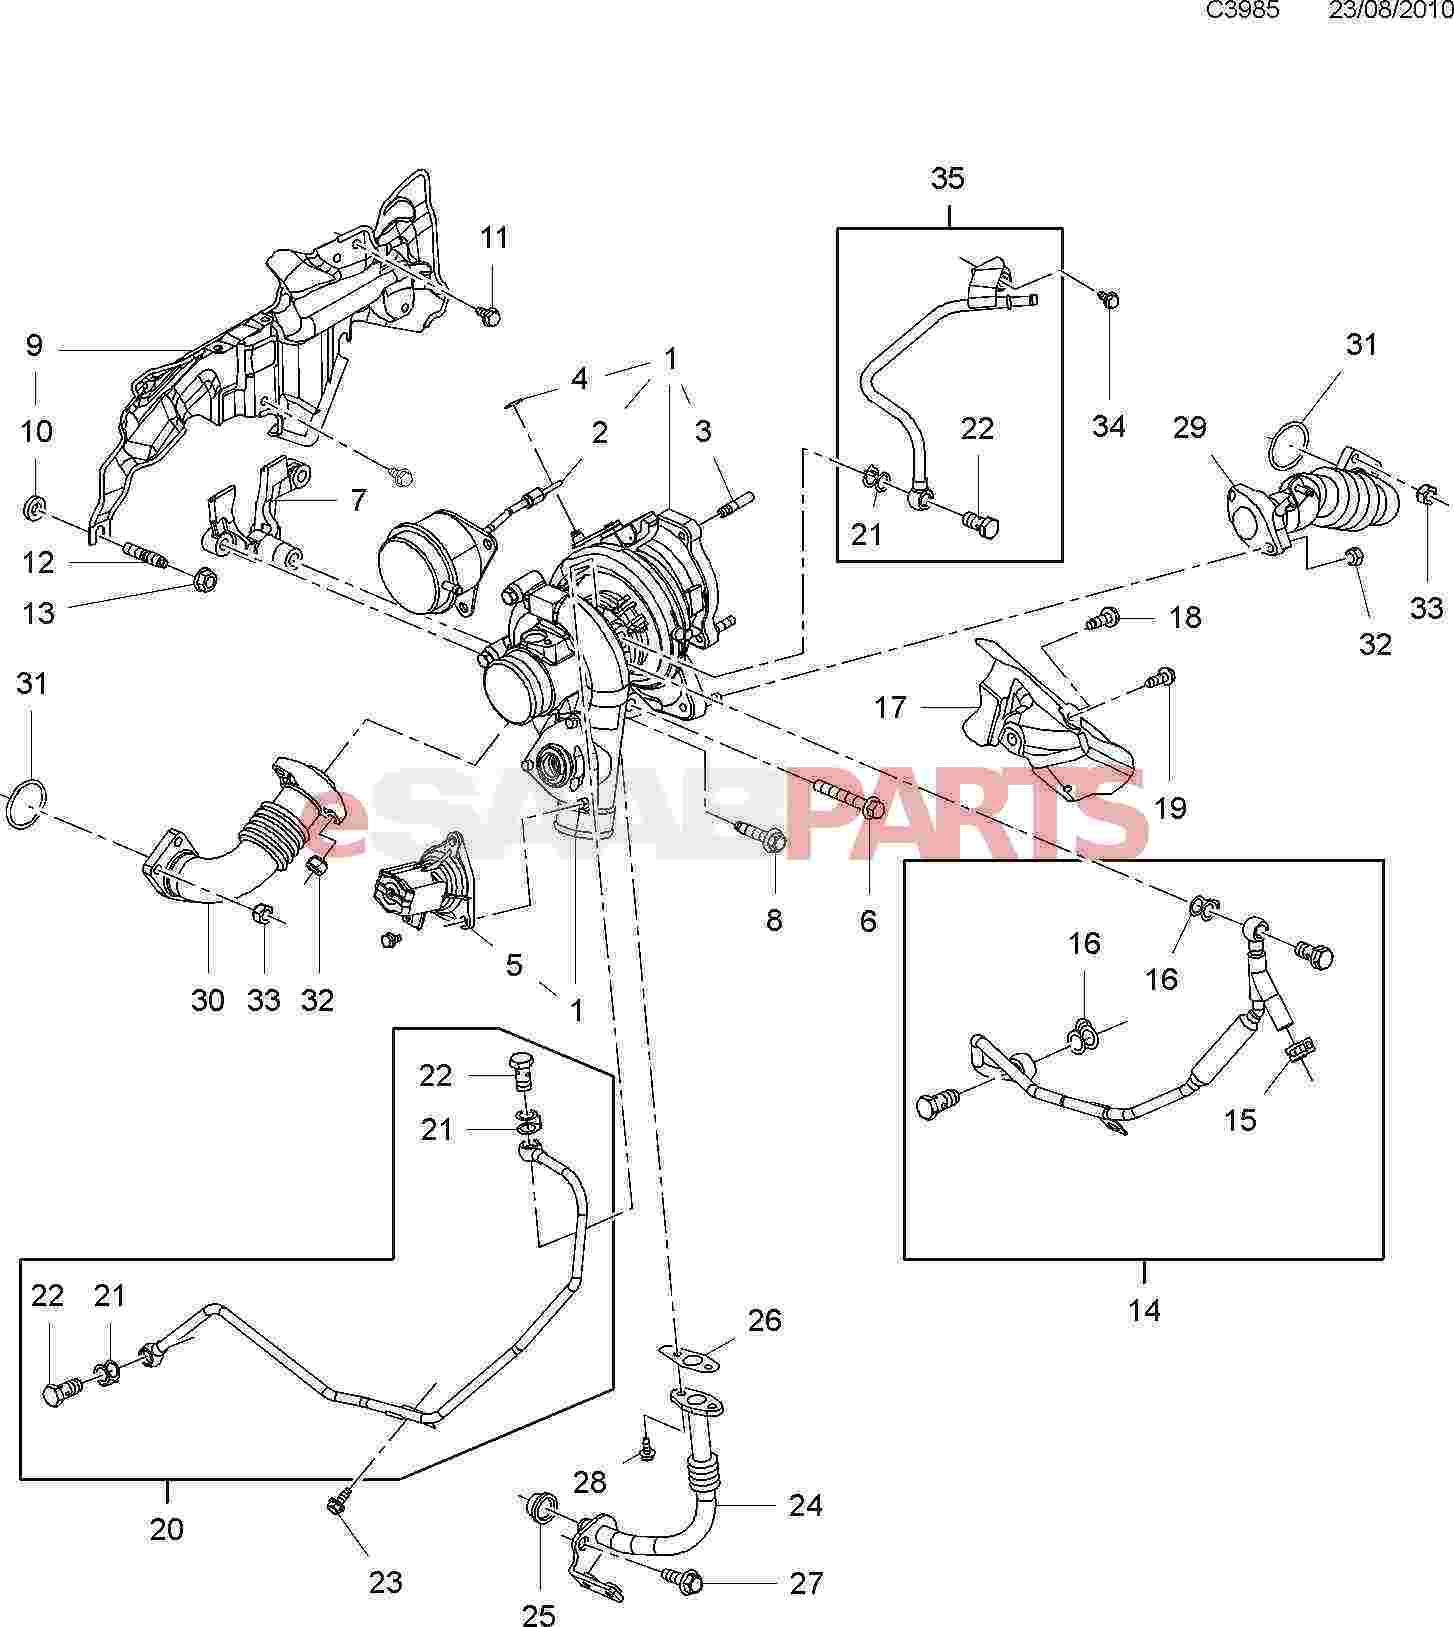 saab xwd wiring diagram  saab  get free image about wiring diagram